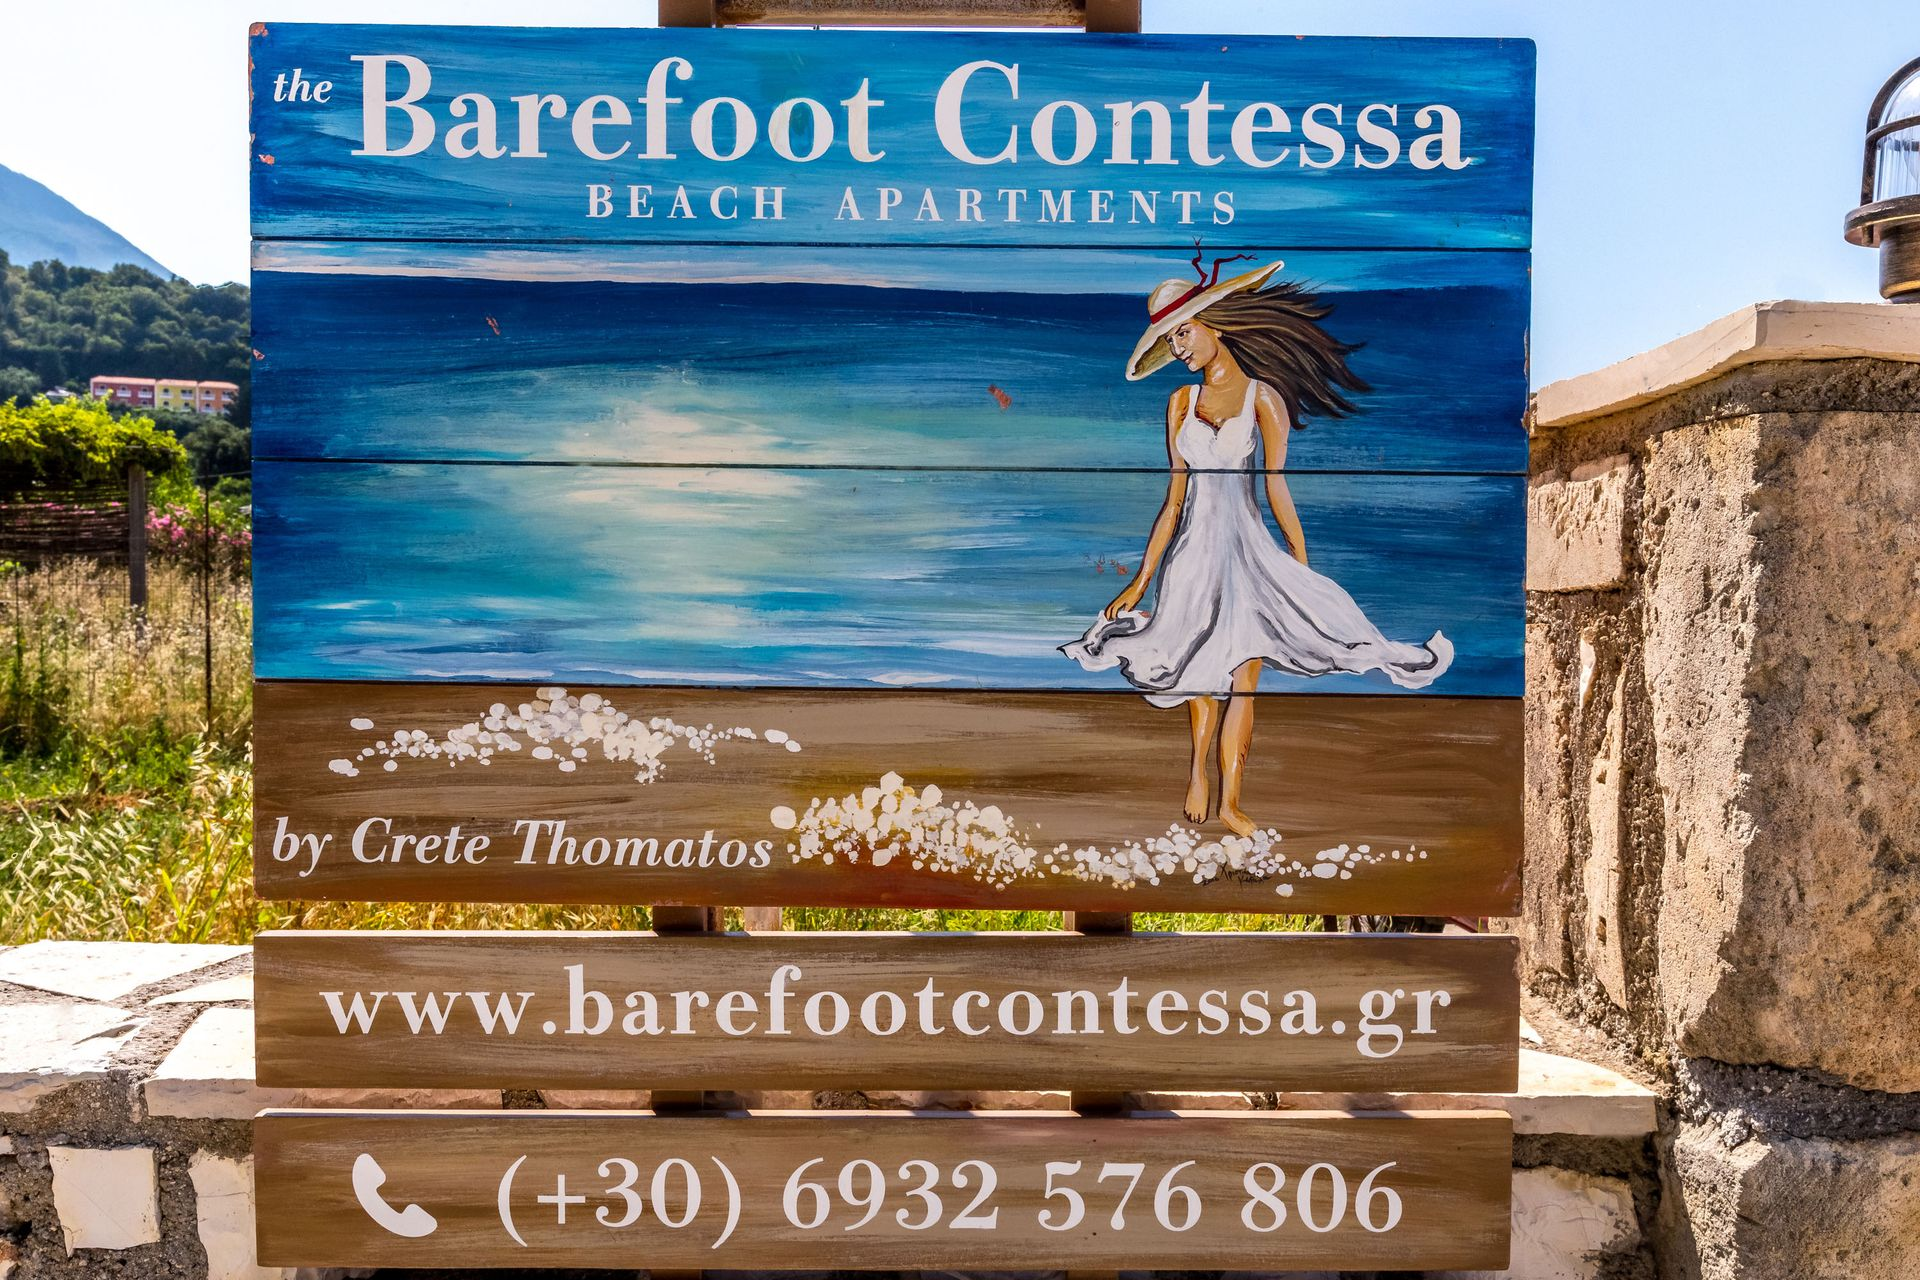 Barefoot Contessa Lourdas